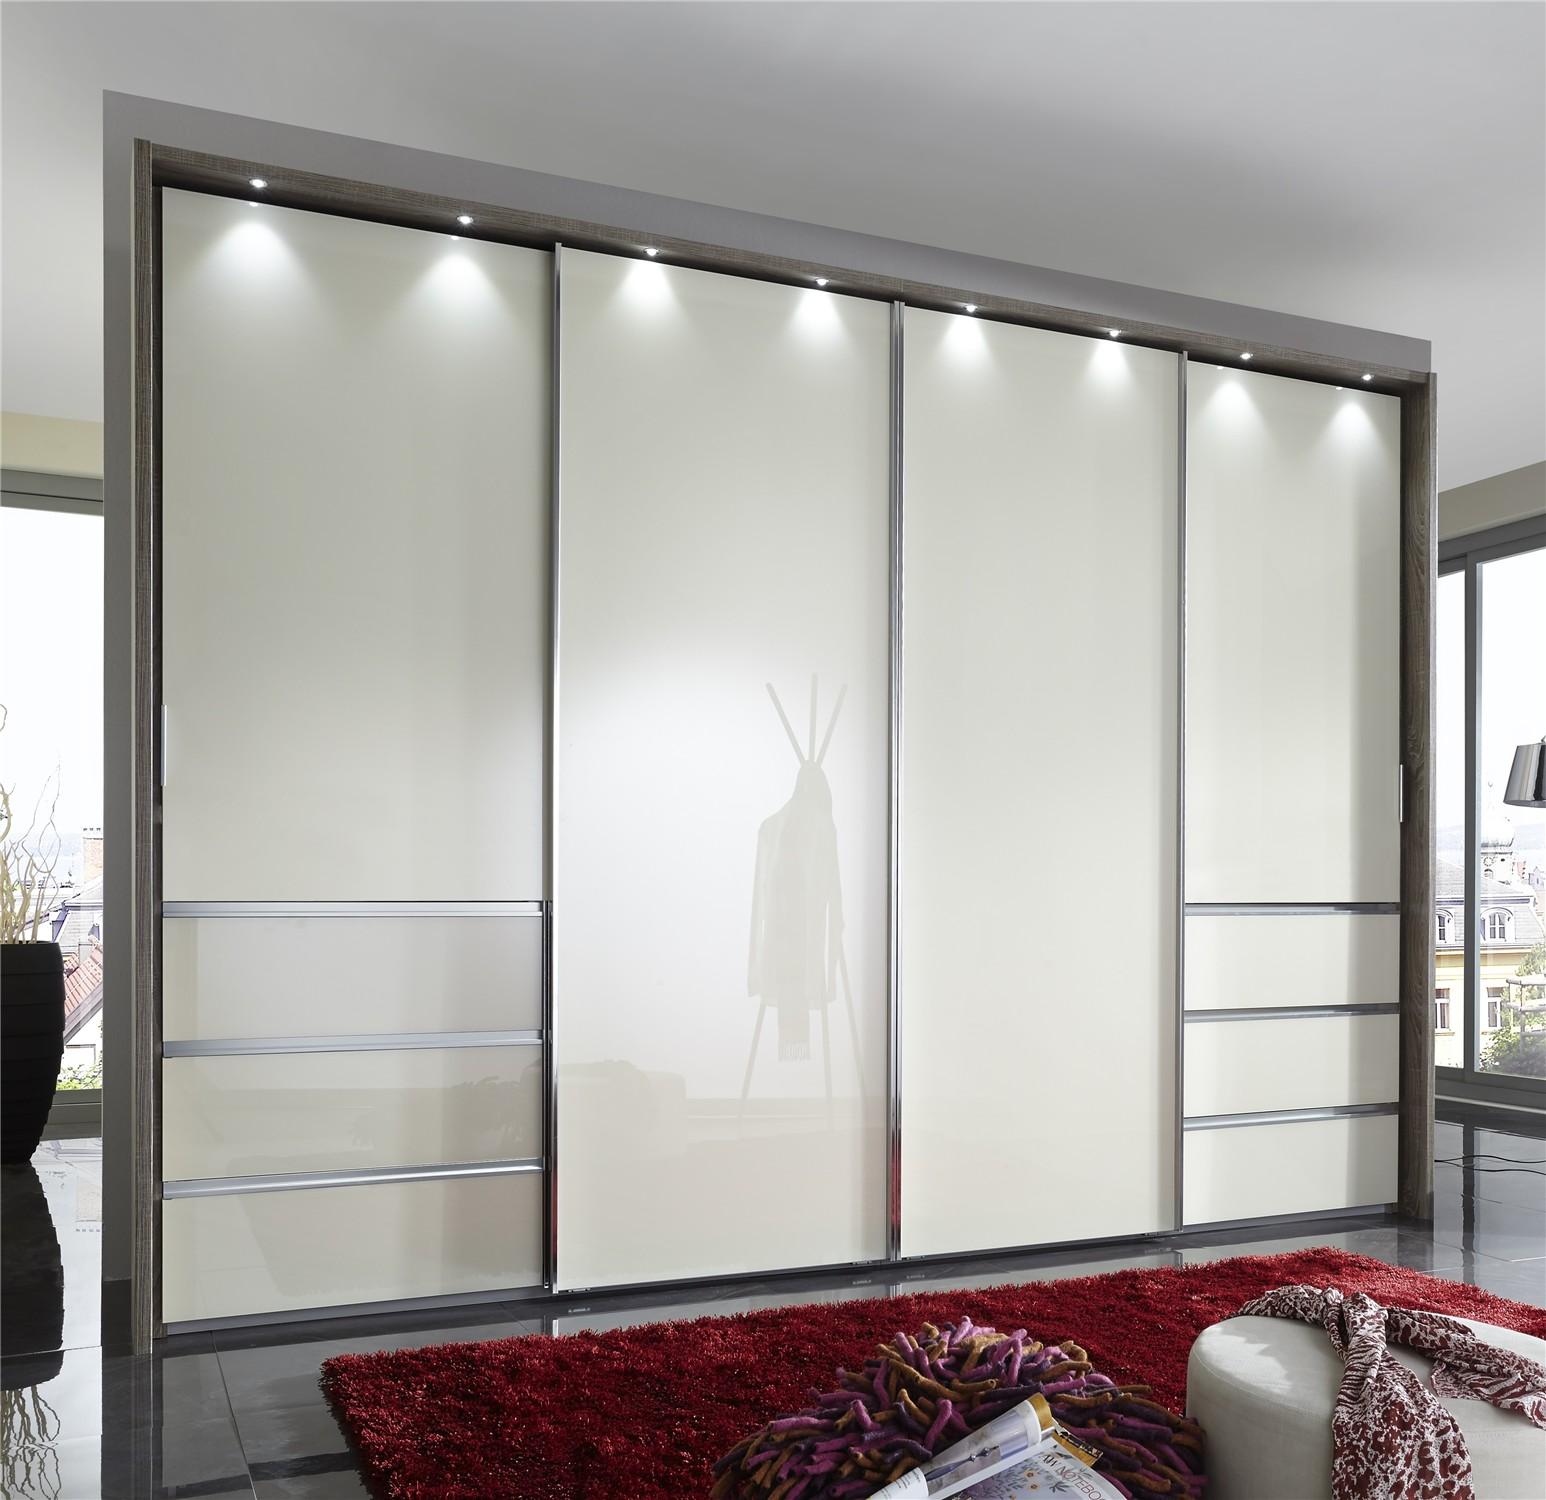 timeless design c238b b2102 Stylform HELIOS - 250-330cm Glass/Wood/Mirrored Sliding Wardrobe with  optional drawers